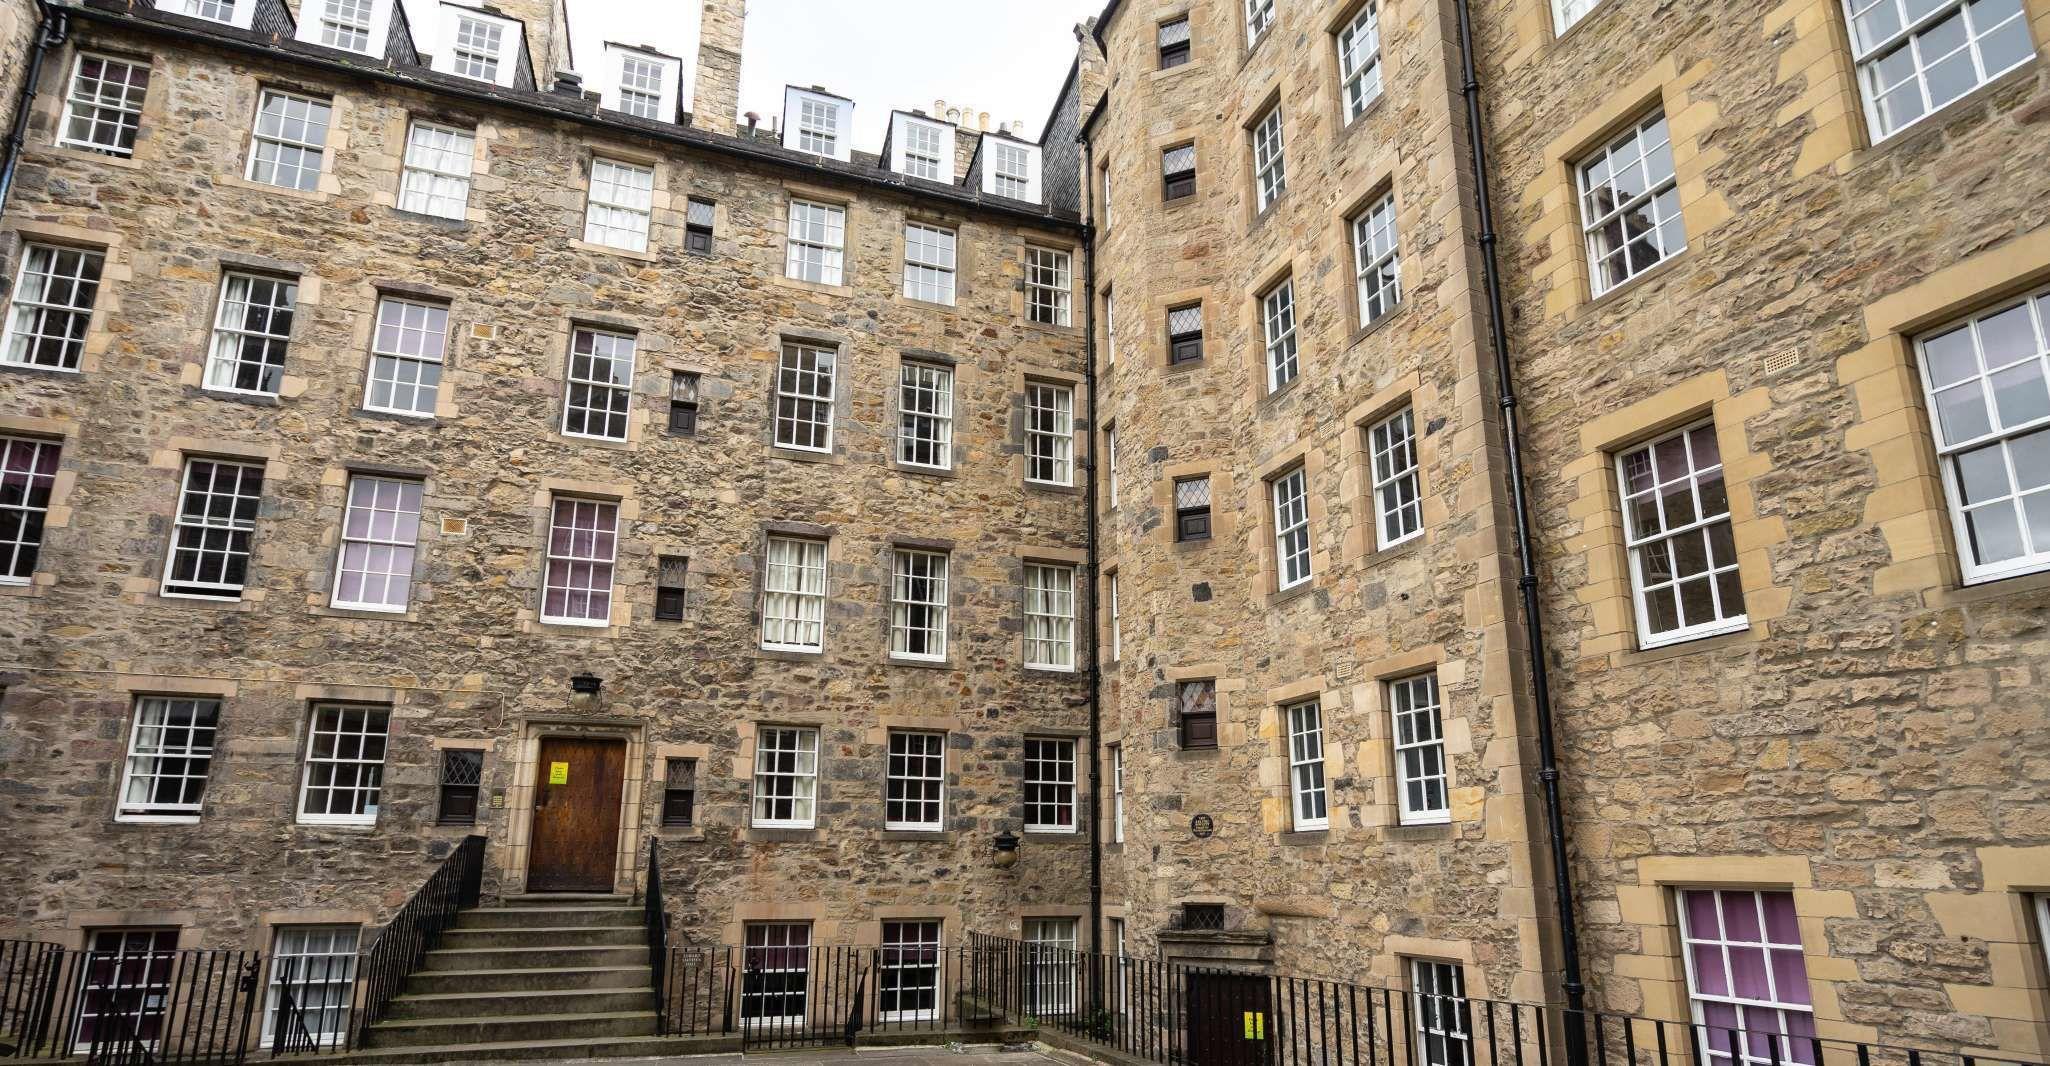 Edinburgh: Secrets of Old Town Walking Tour